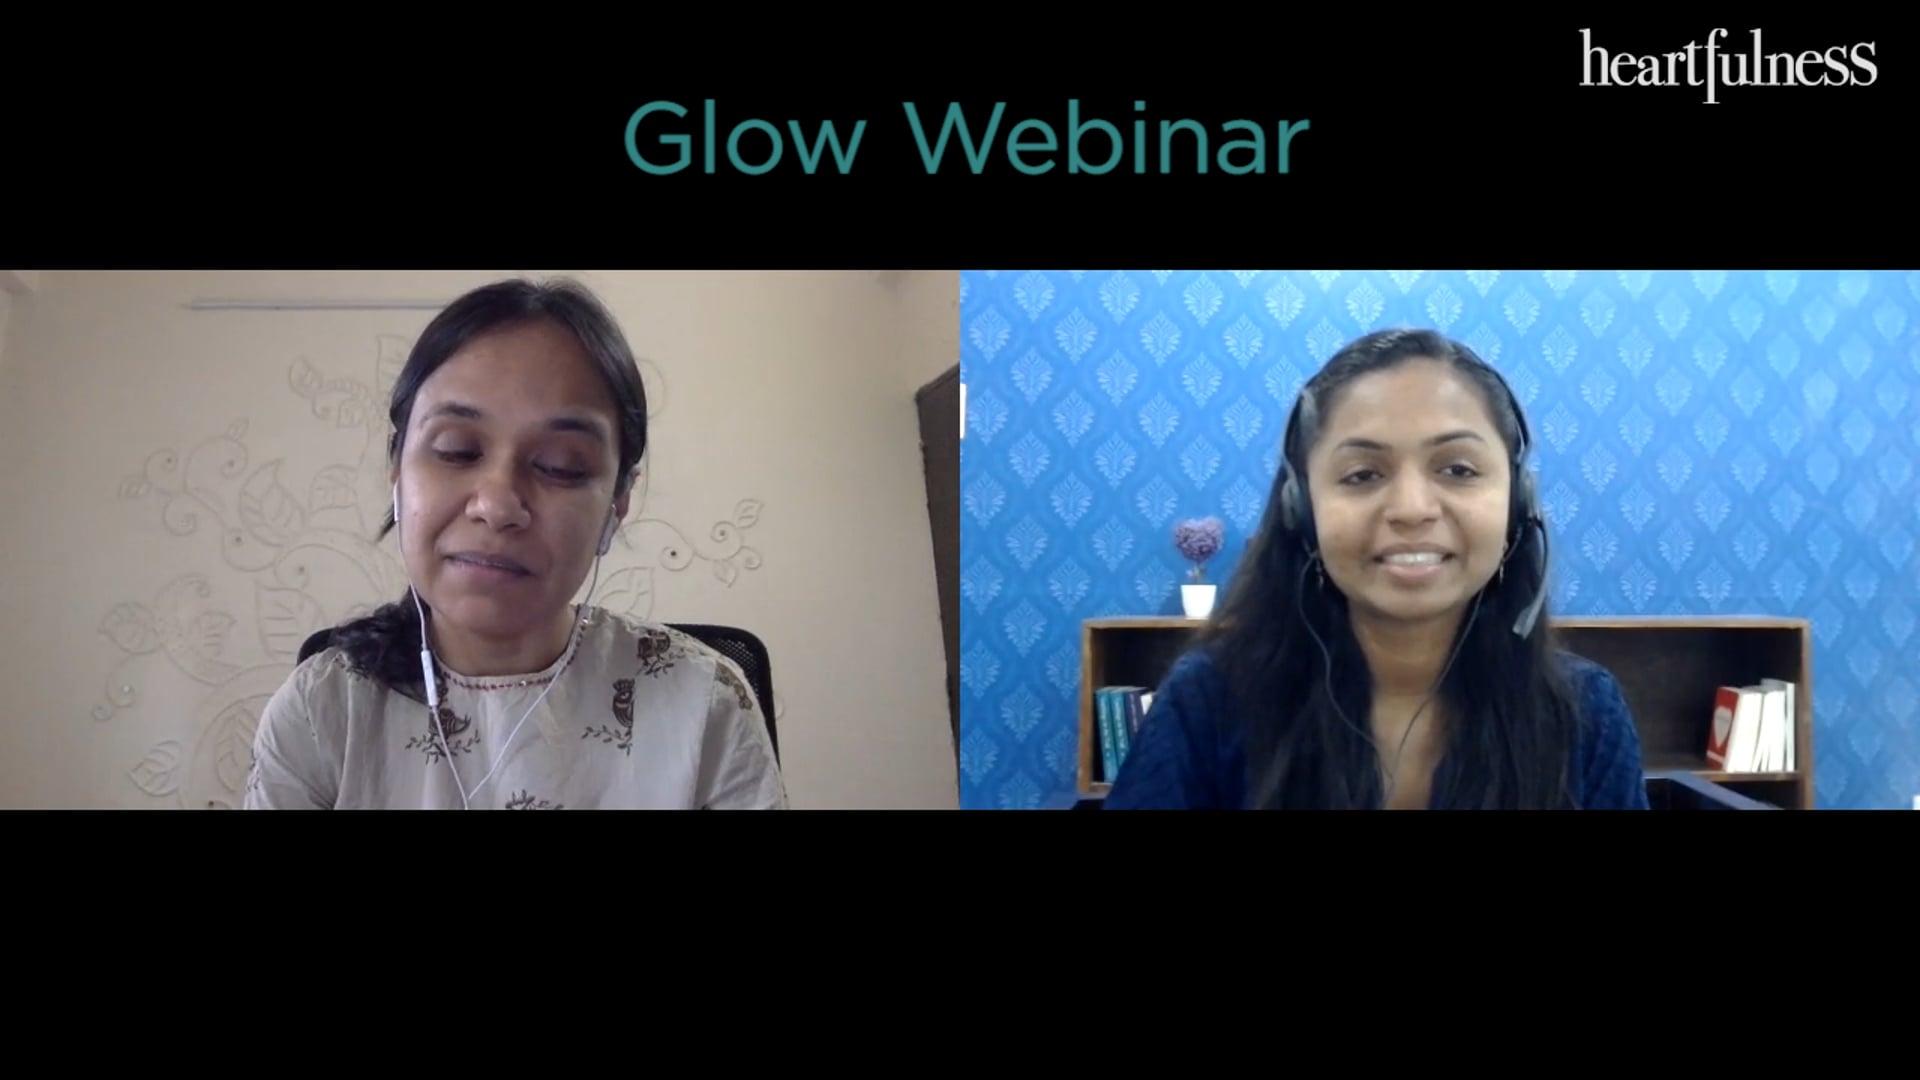 Glow Webinar - Transformation